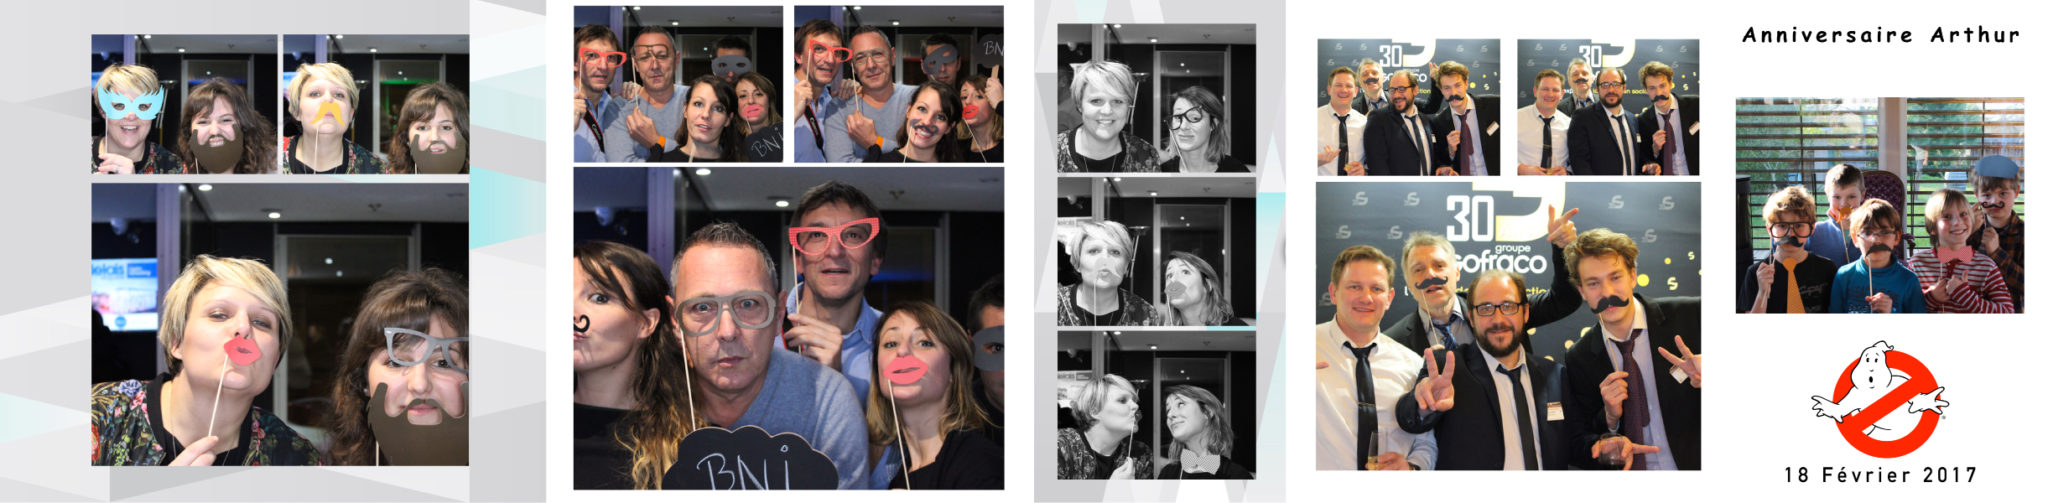 latelier-250-montage-photobooth